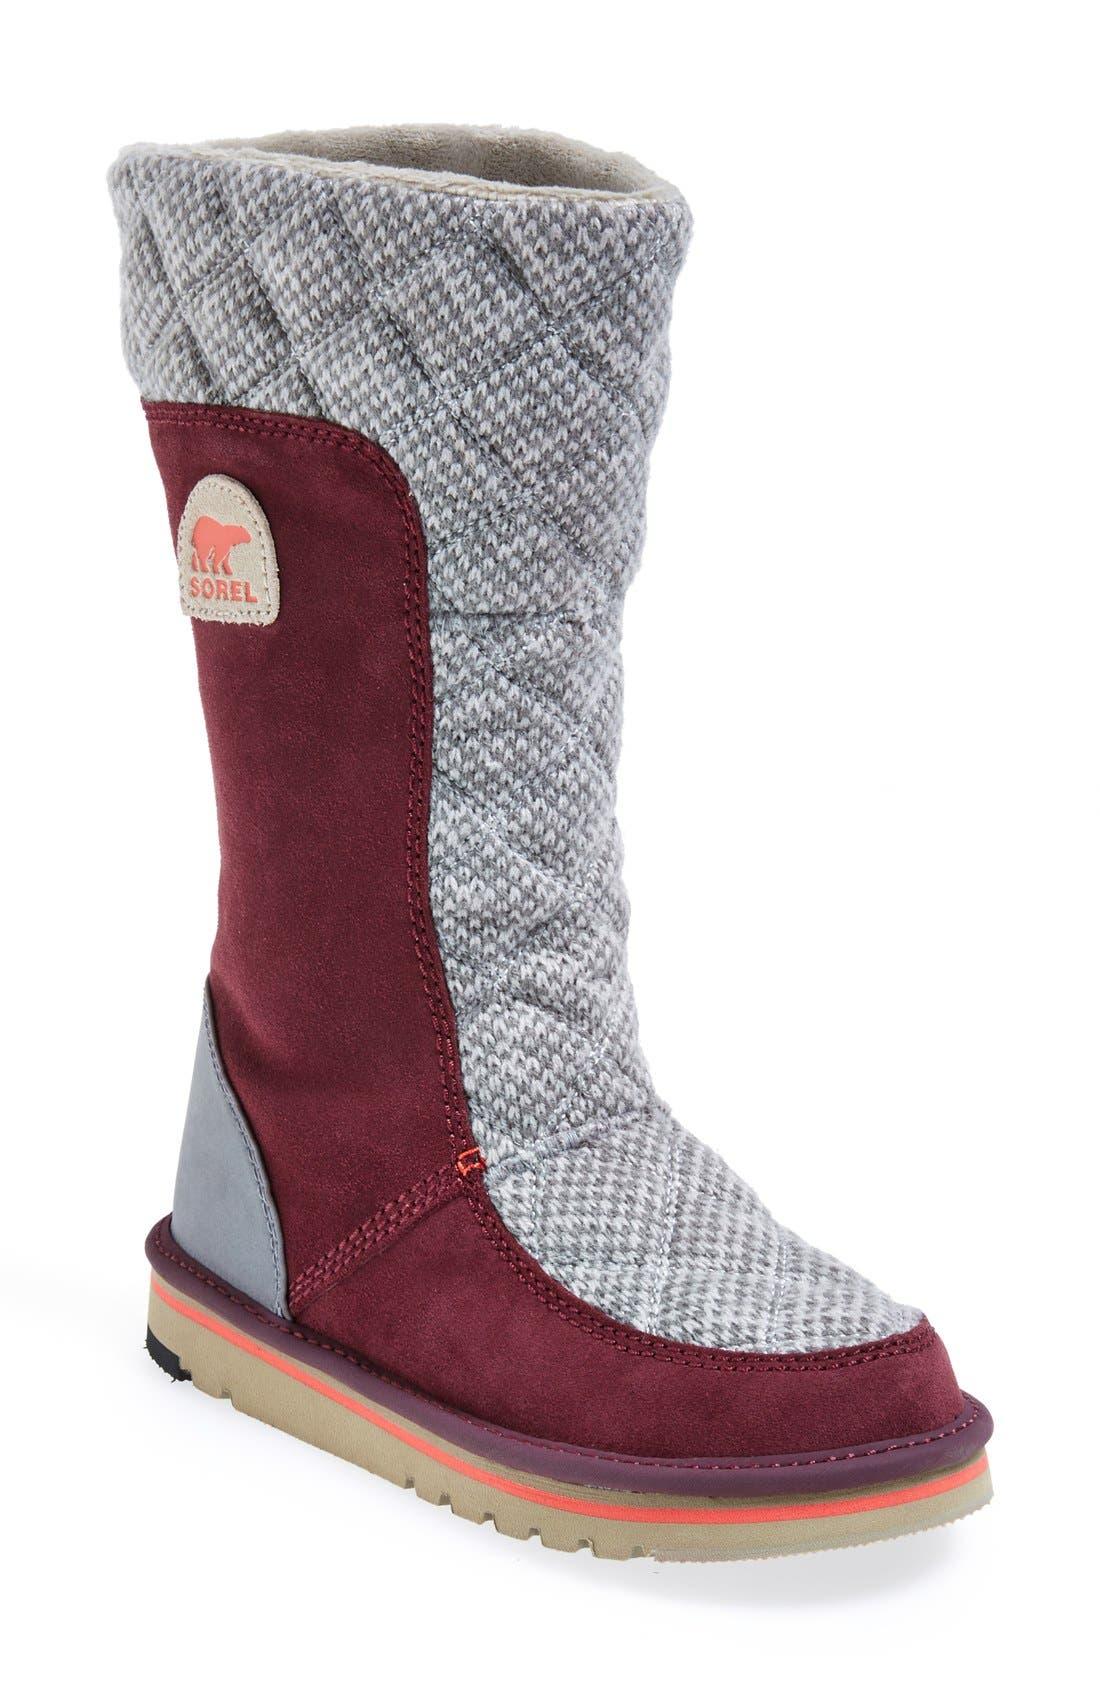 Main Image - SOREL 'Campus' Water Resistant Tall Boot (Women)